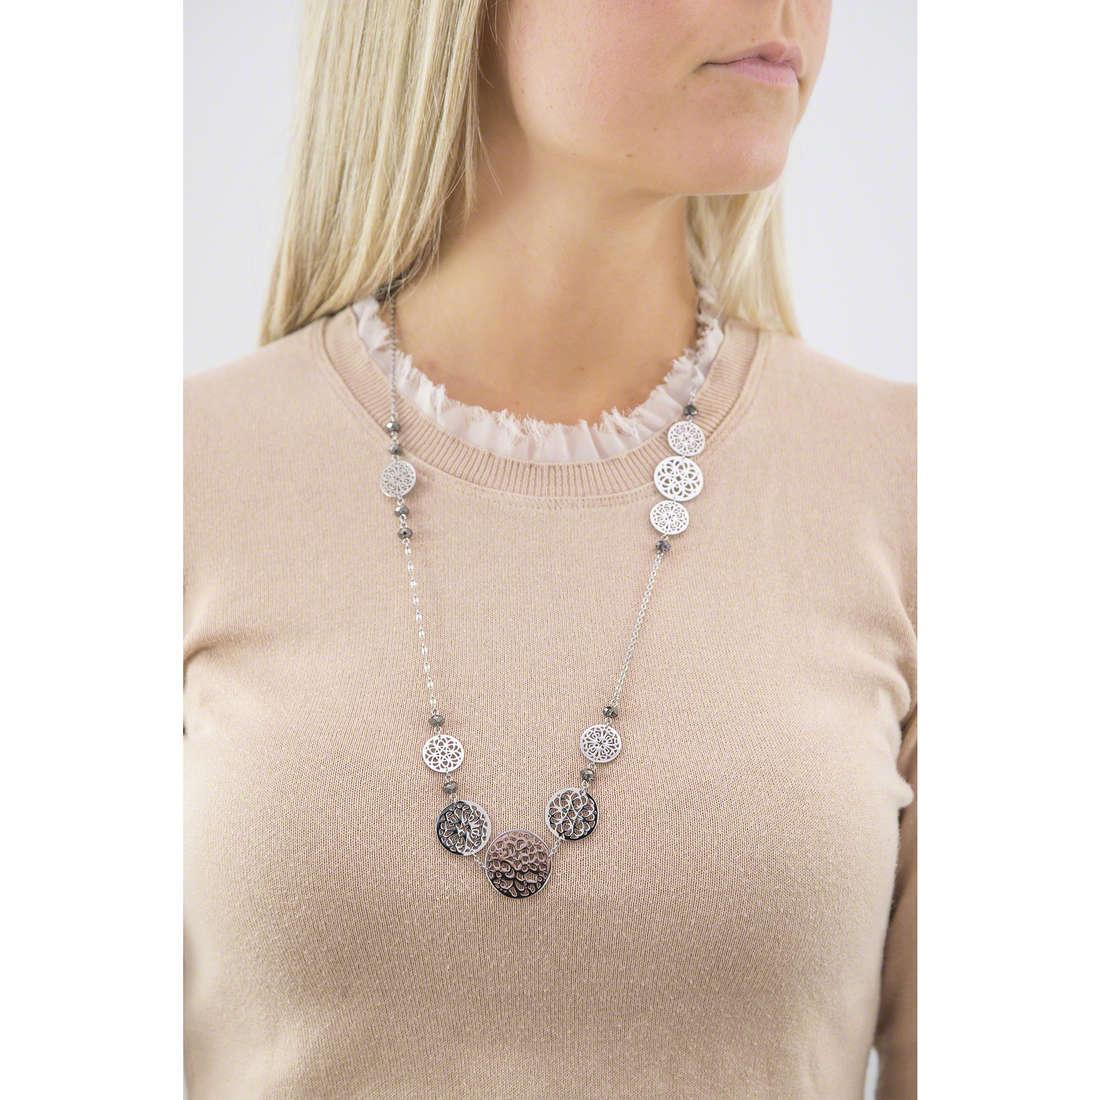 Brosway colliers Abracadabra femme BAB02 indosso